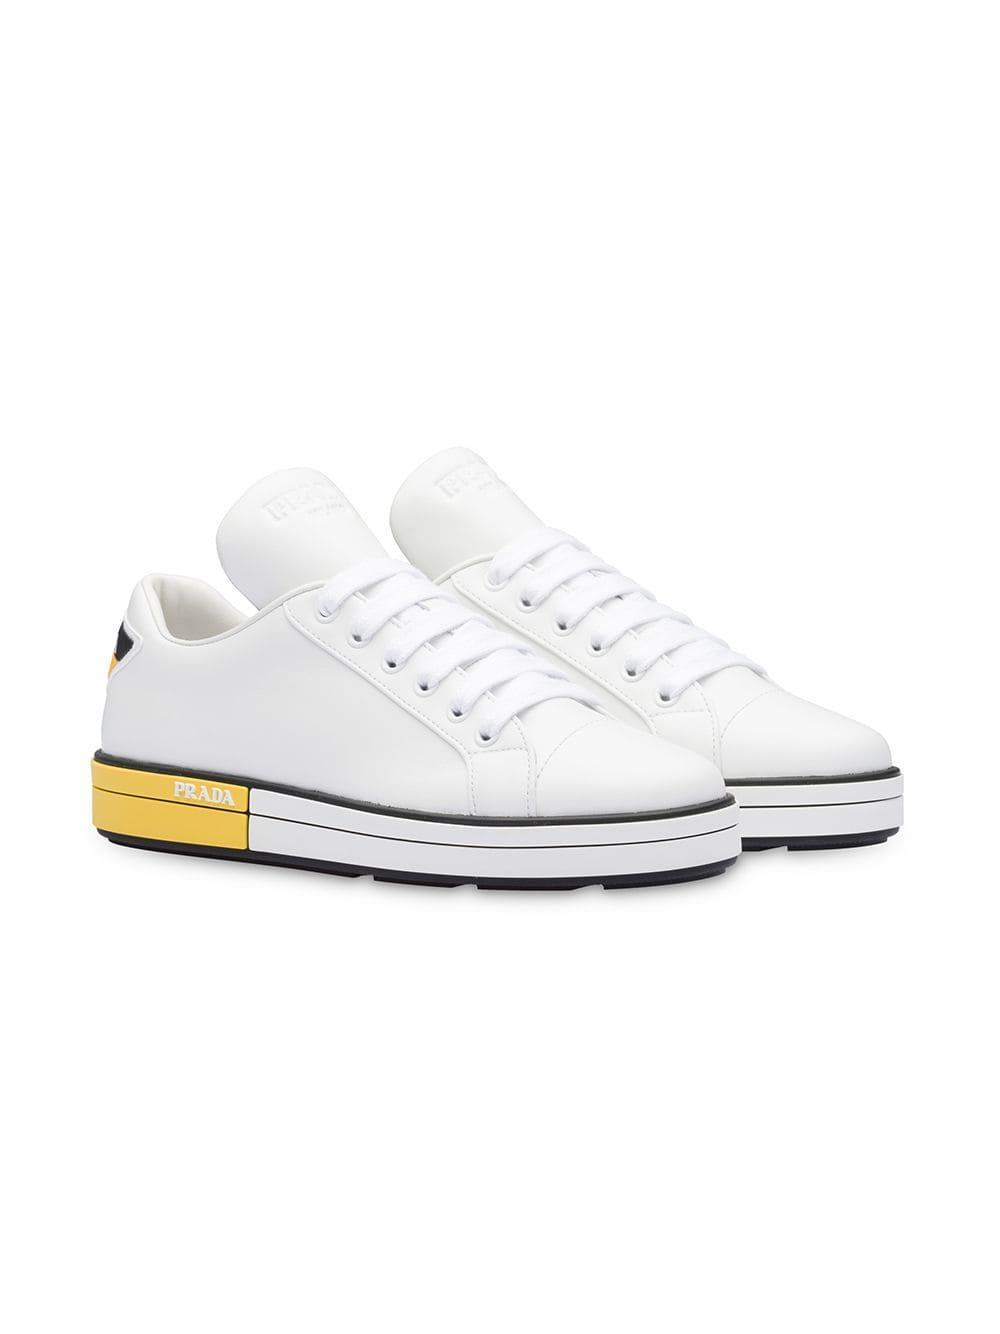 253c23858ed Lyst - Prada Platform Sneakers in White